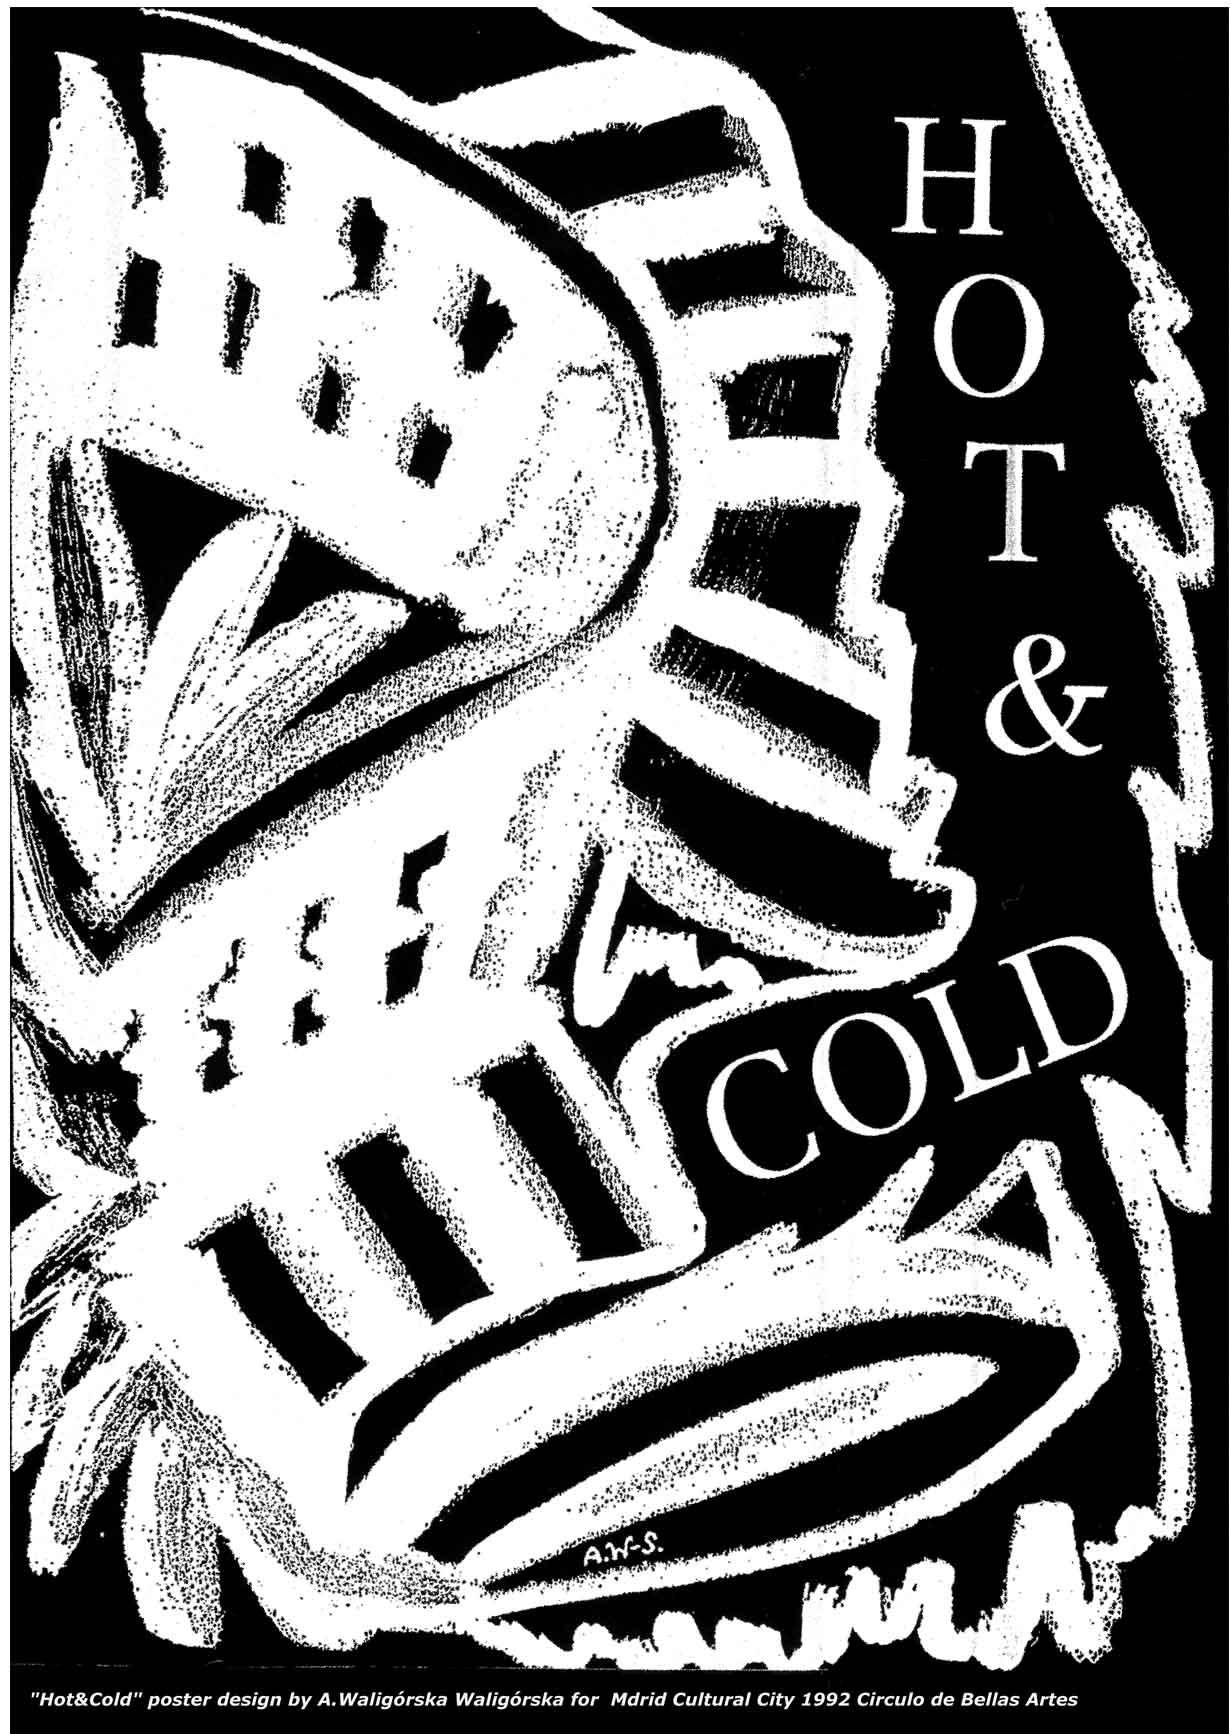 Agnieszka Waligorska & Pekka Sirén: Hot & Cold